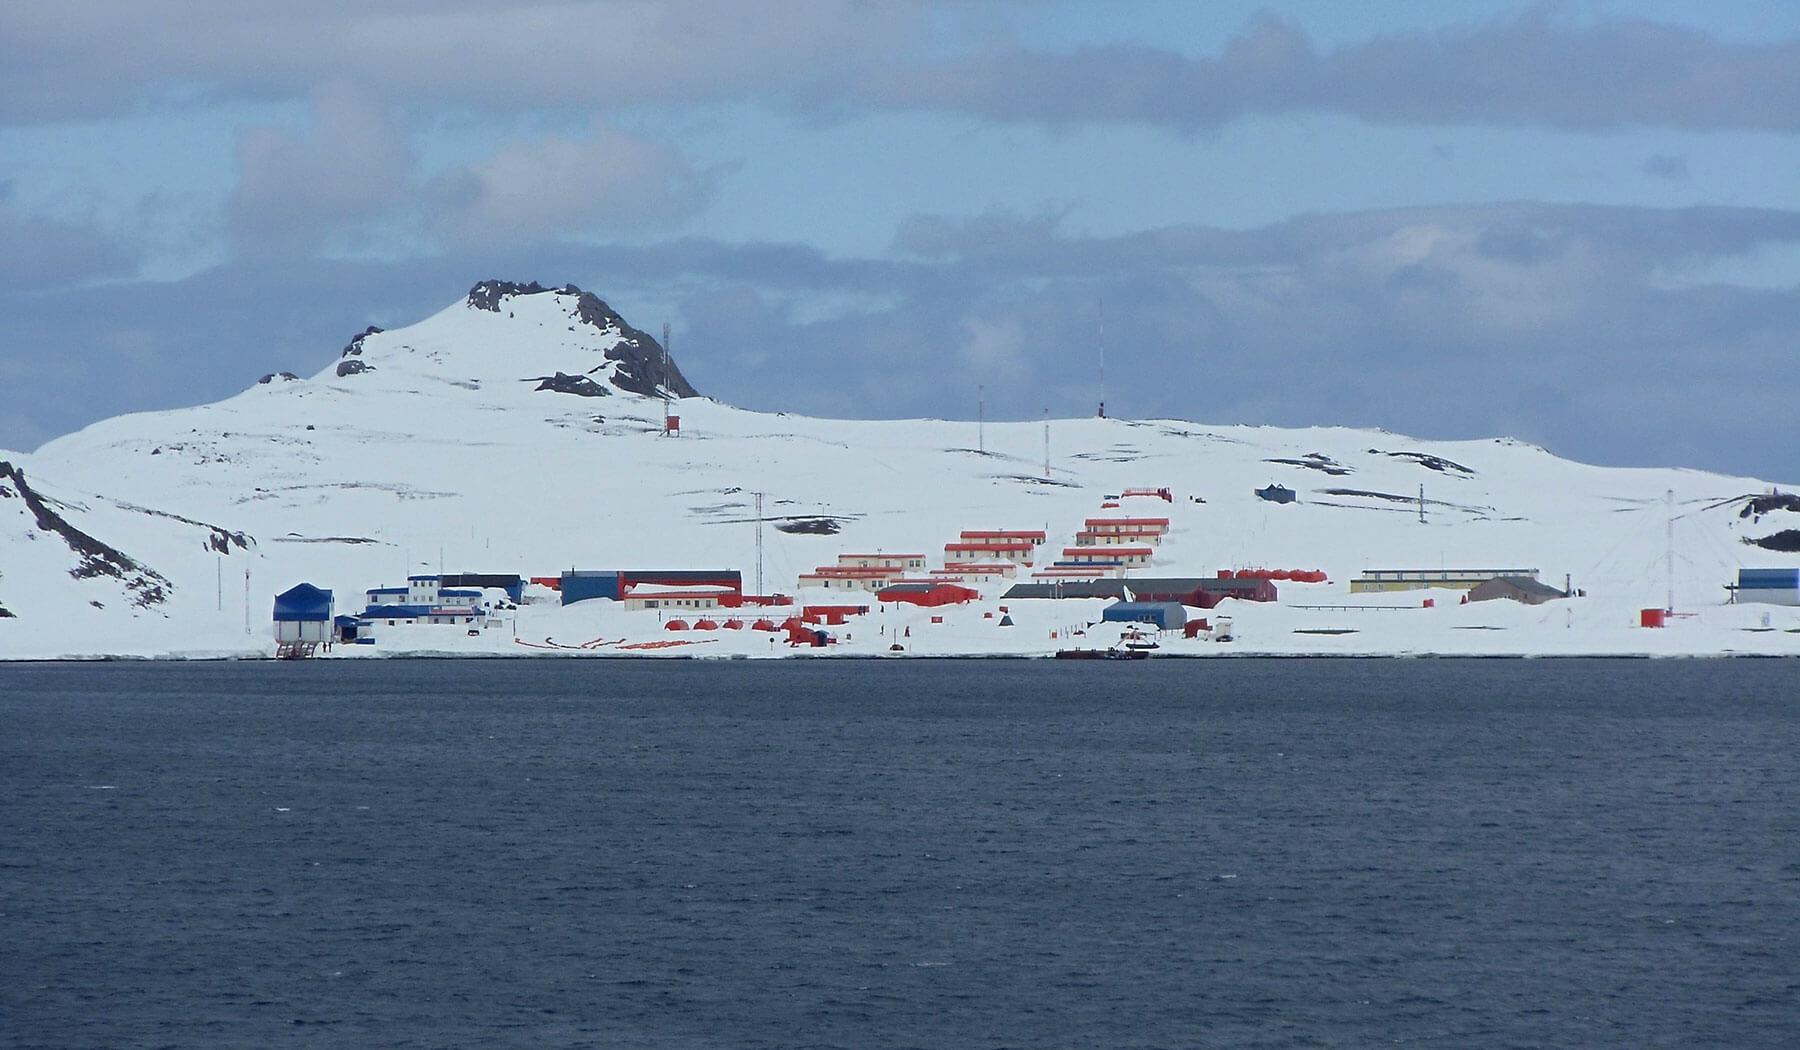 деревня в Антарктике